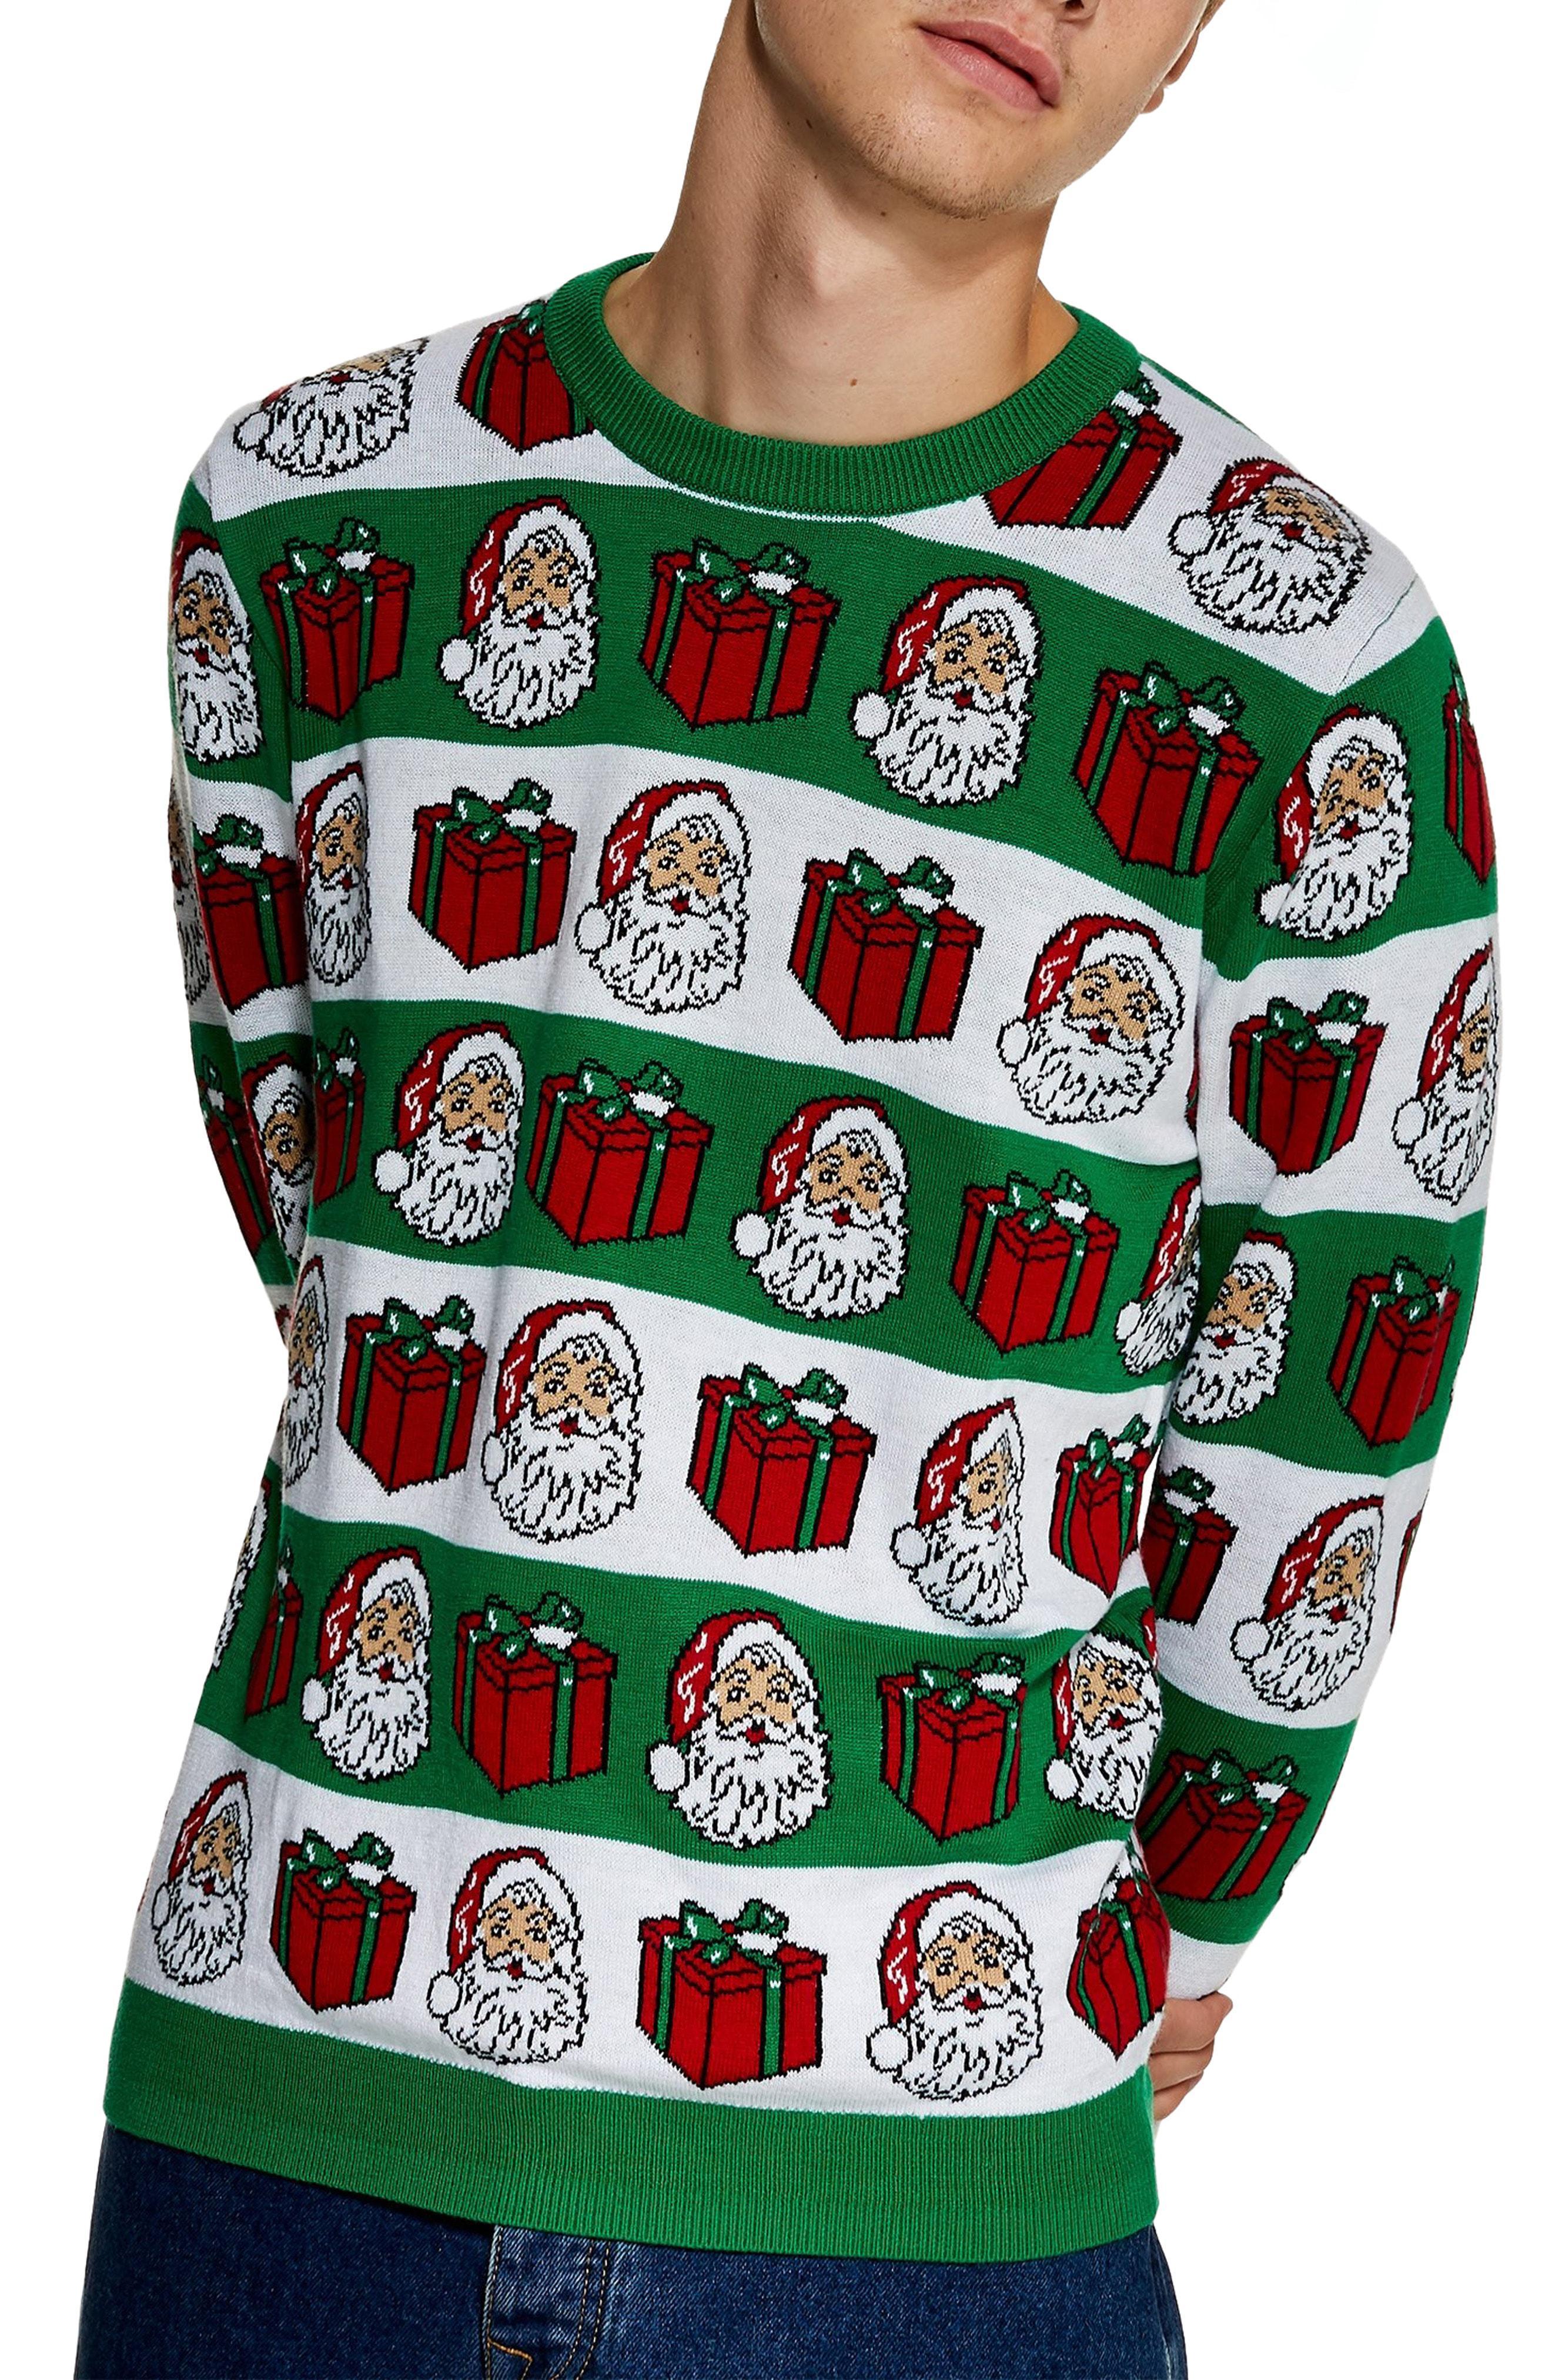 Lyst - Topman Christmas Santa Crewneck Sweater in Green for Men